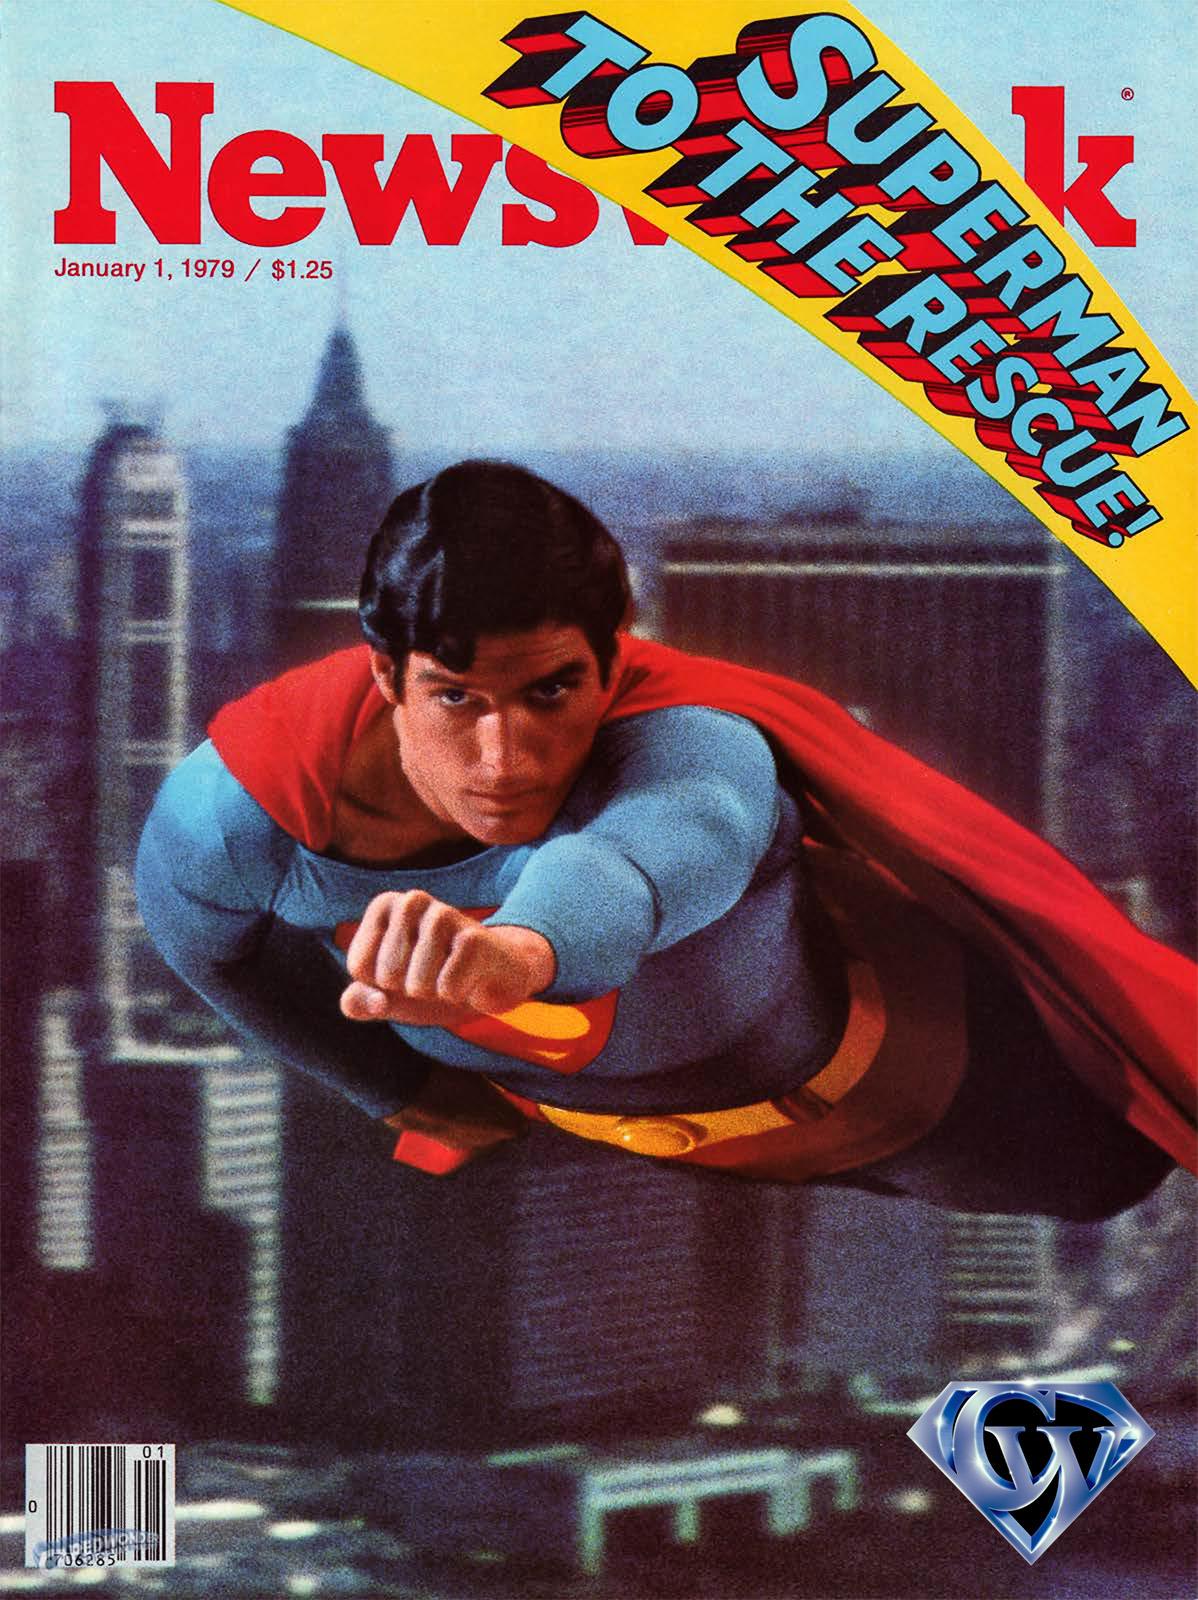 CW-STM-Newsweek-January-1-1979